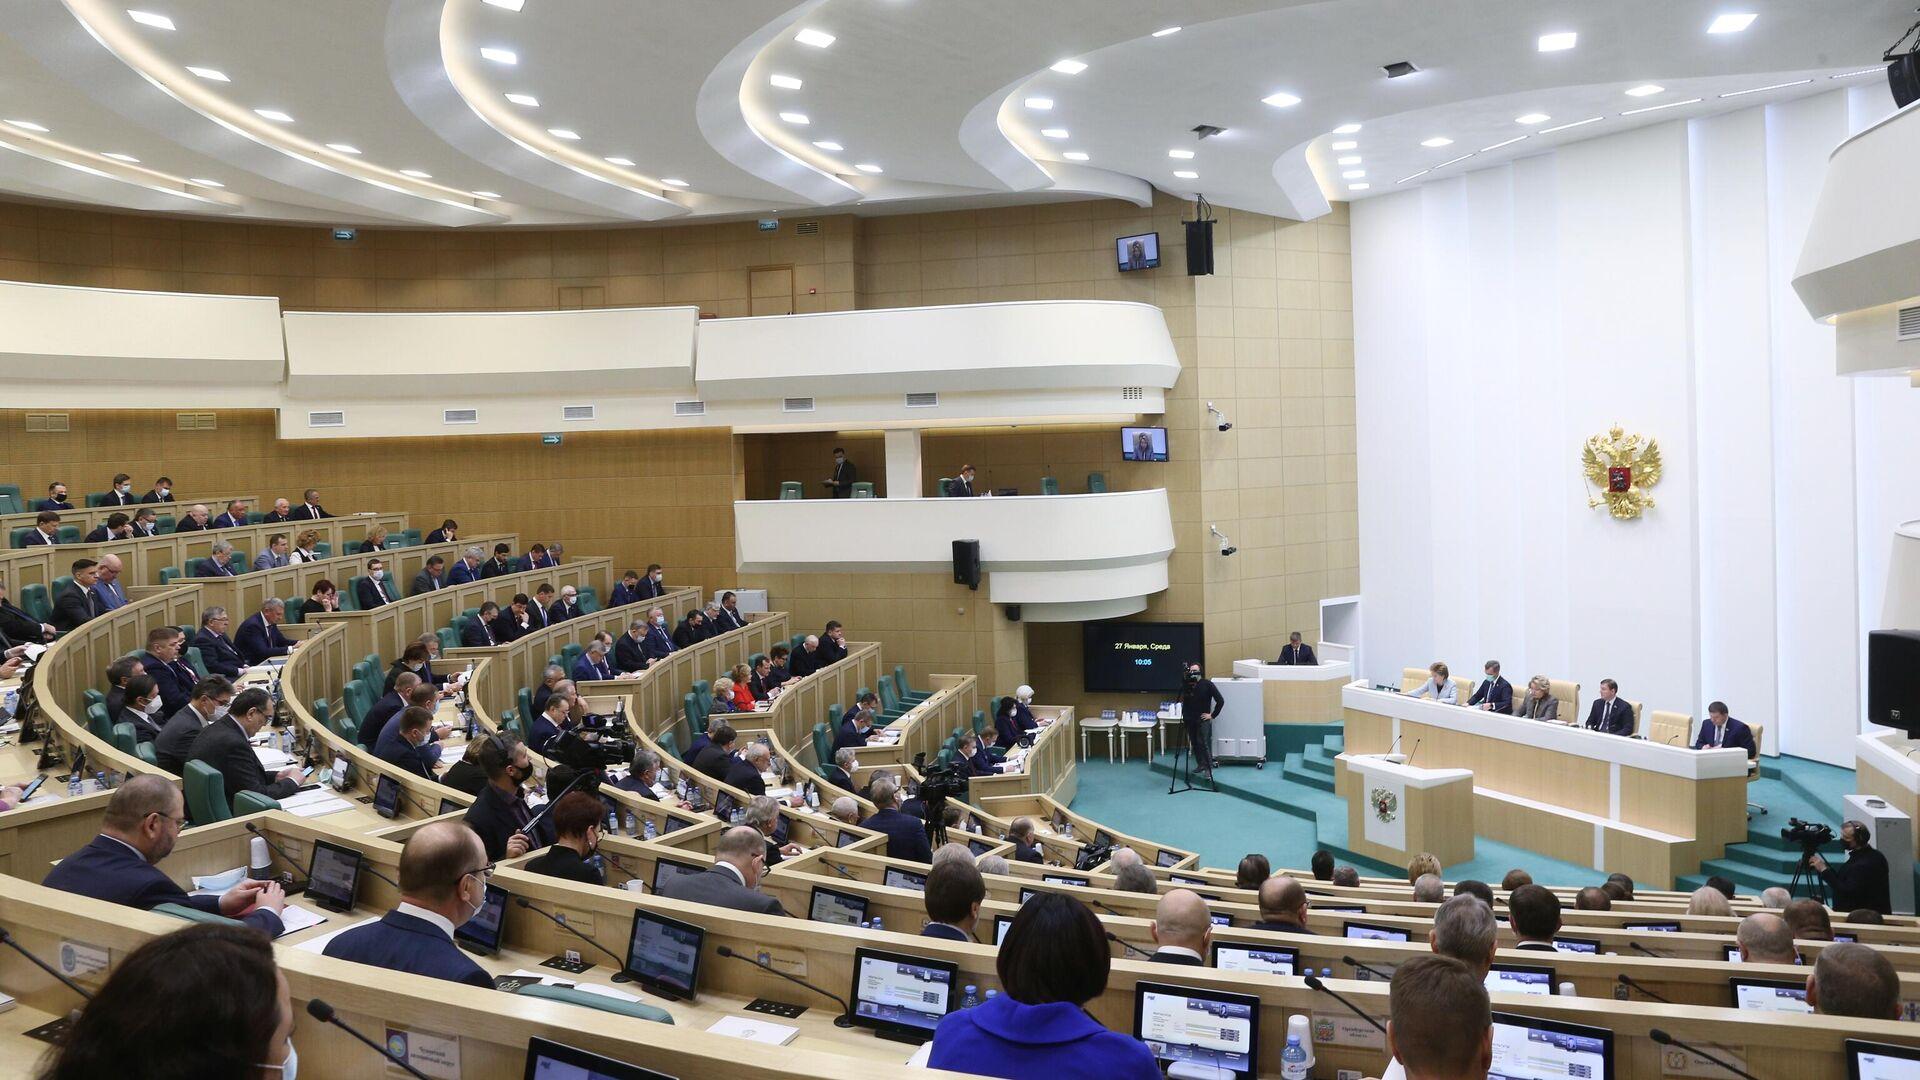 Заседание Совета Федерации РФ - РИА Новости, 1920, 27.01.2021